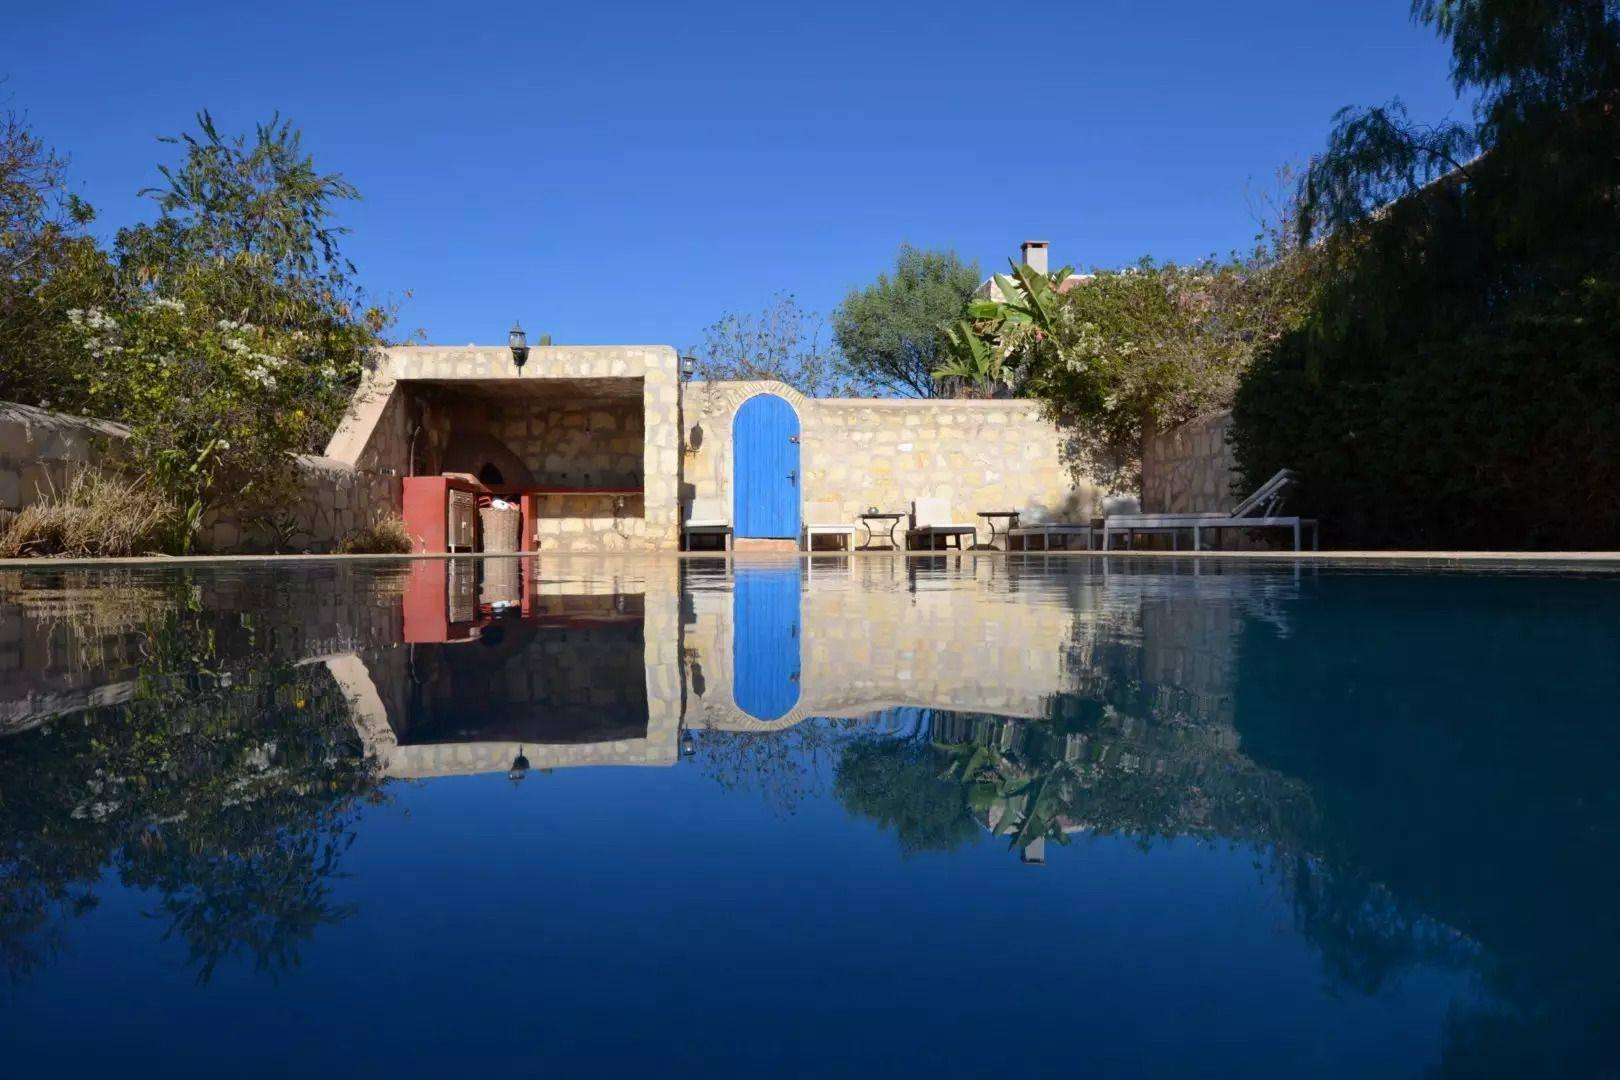 Location - Maison de campagne - 400 m² - Campagne - 1000 € - Essaouira - 8696